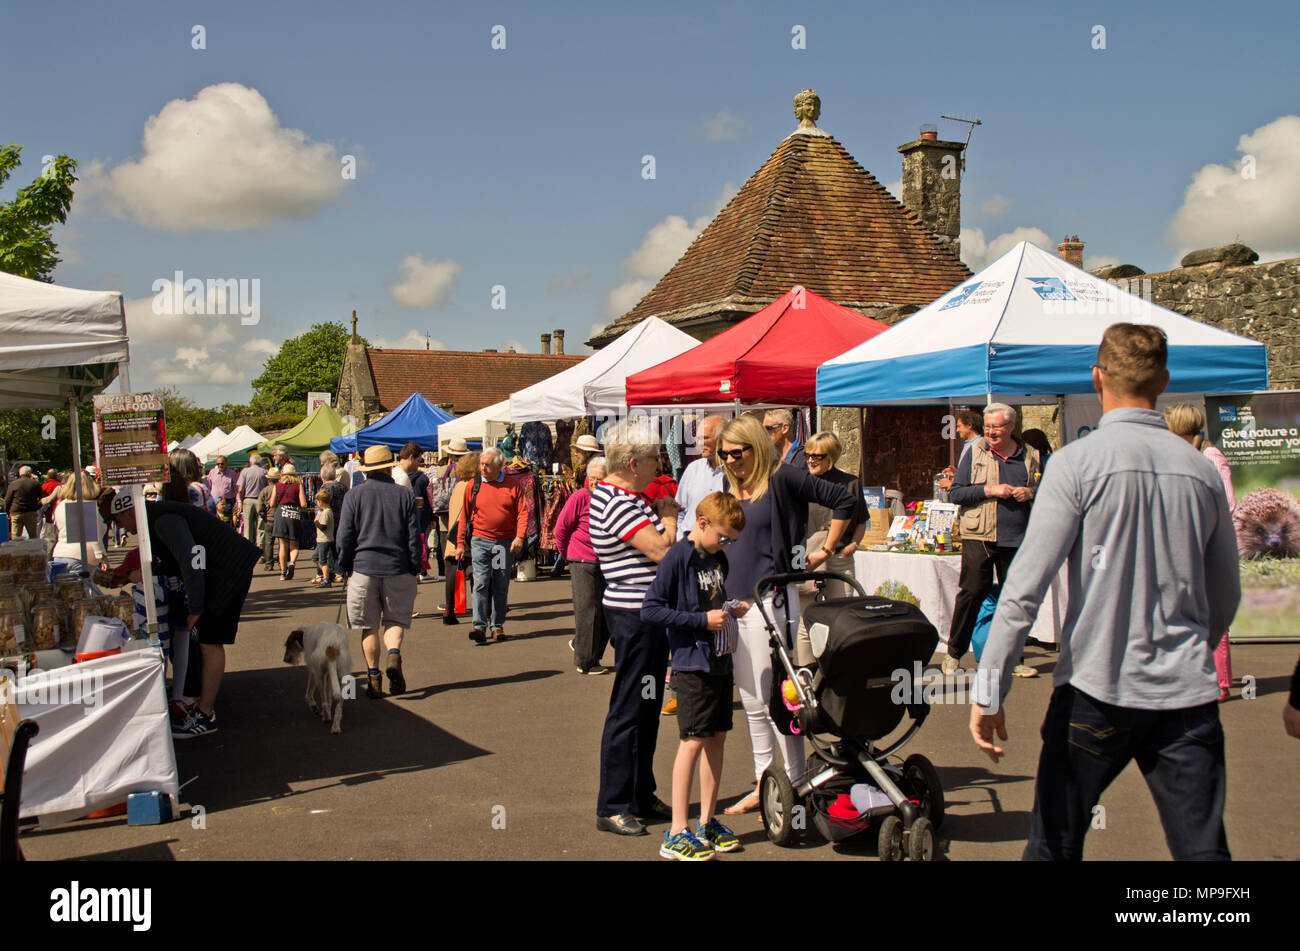 Shaftesbury Food Festival - Stock Image